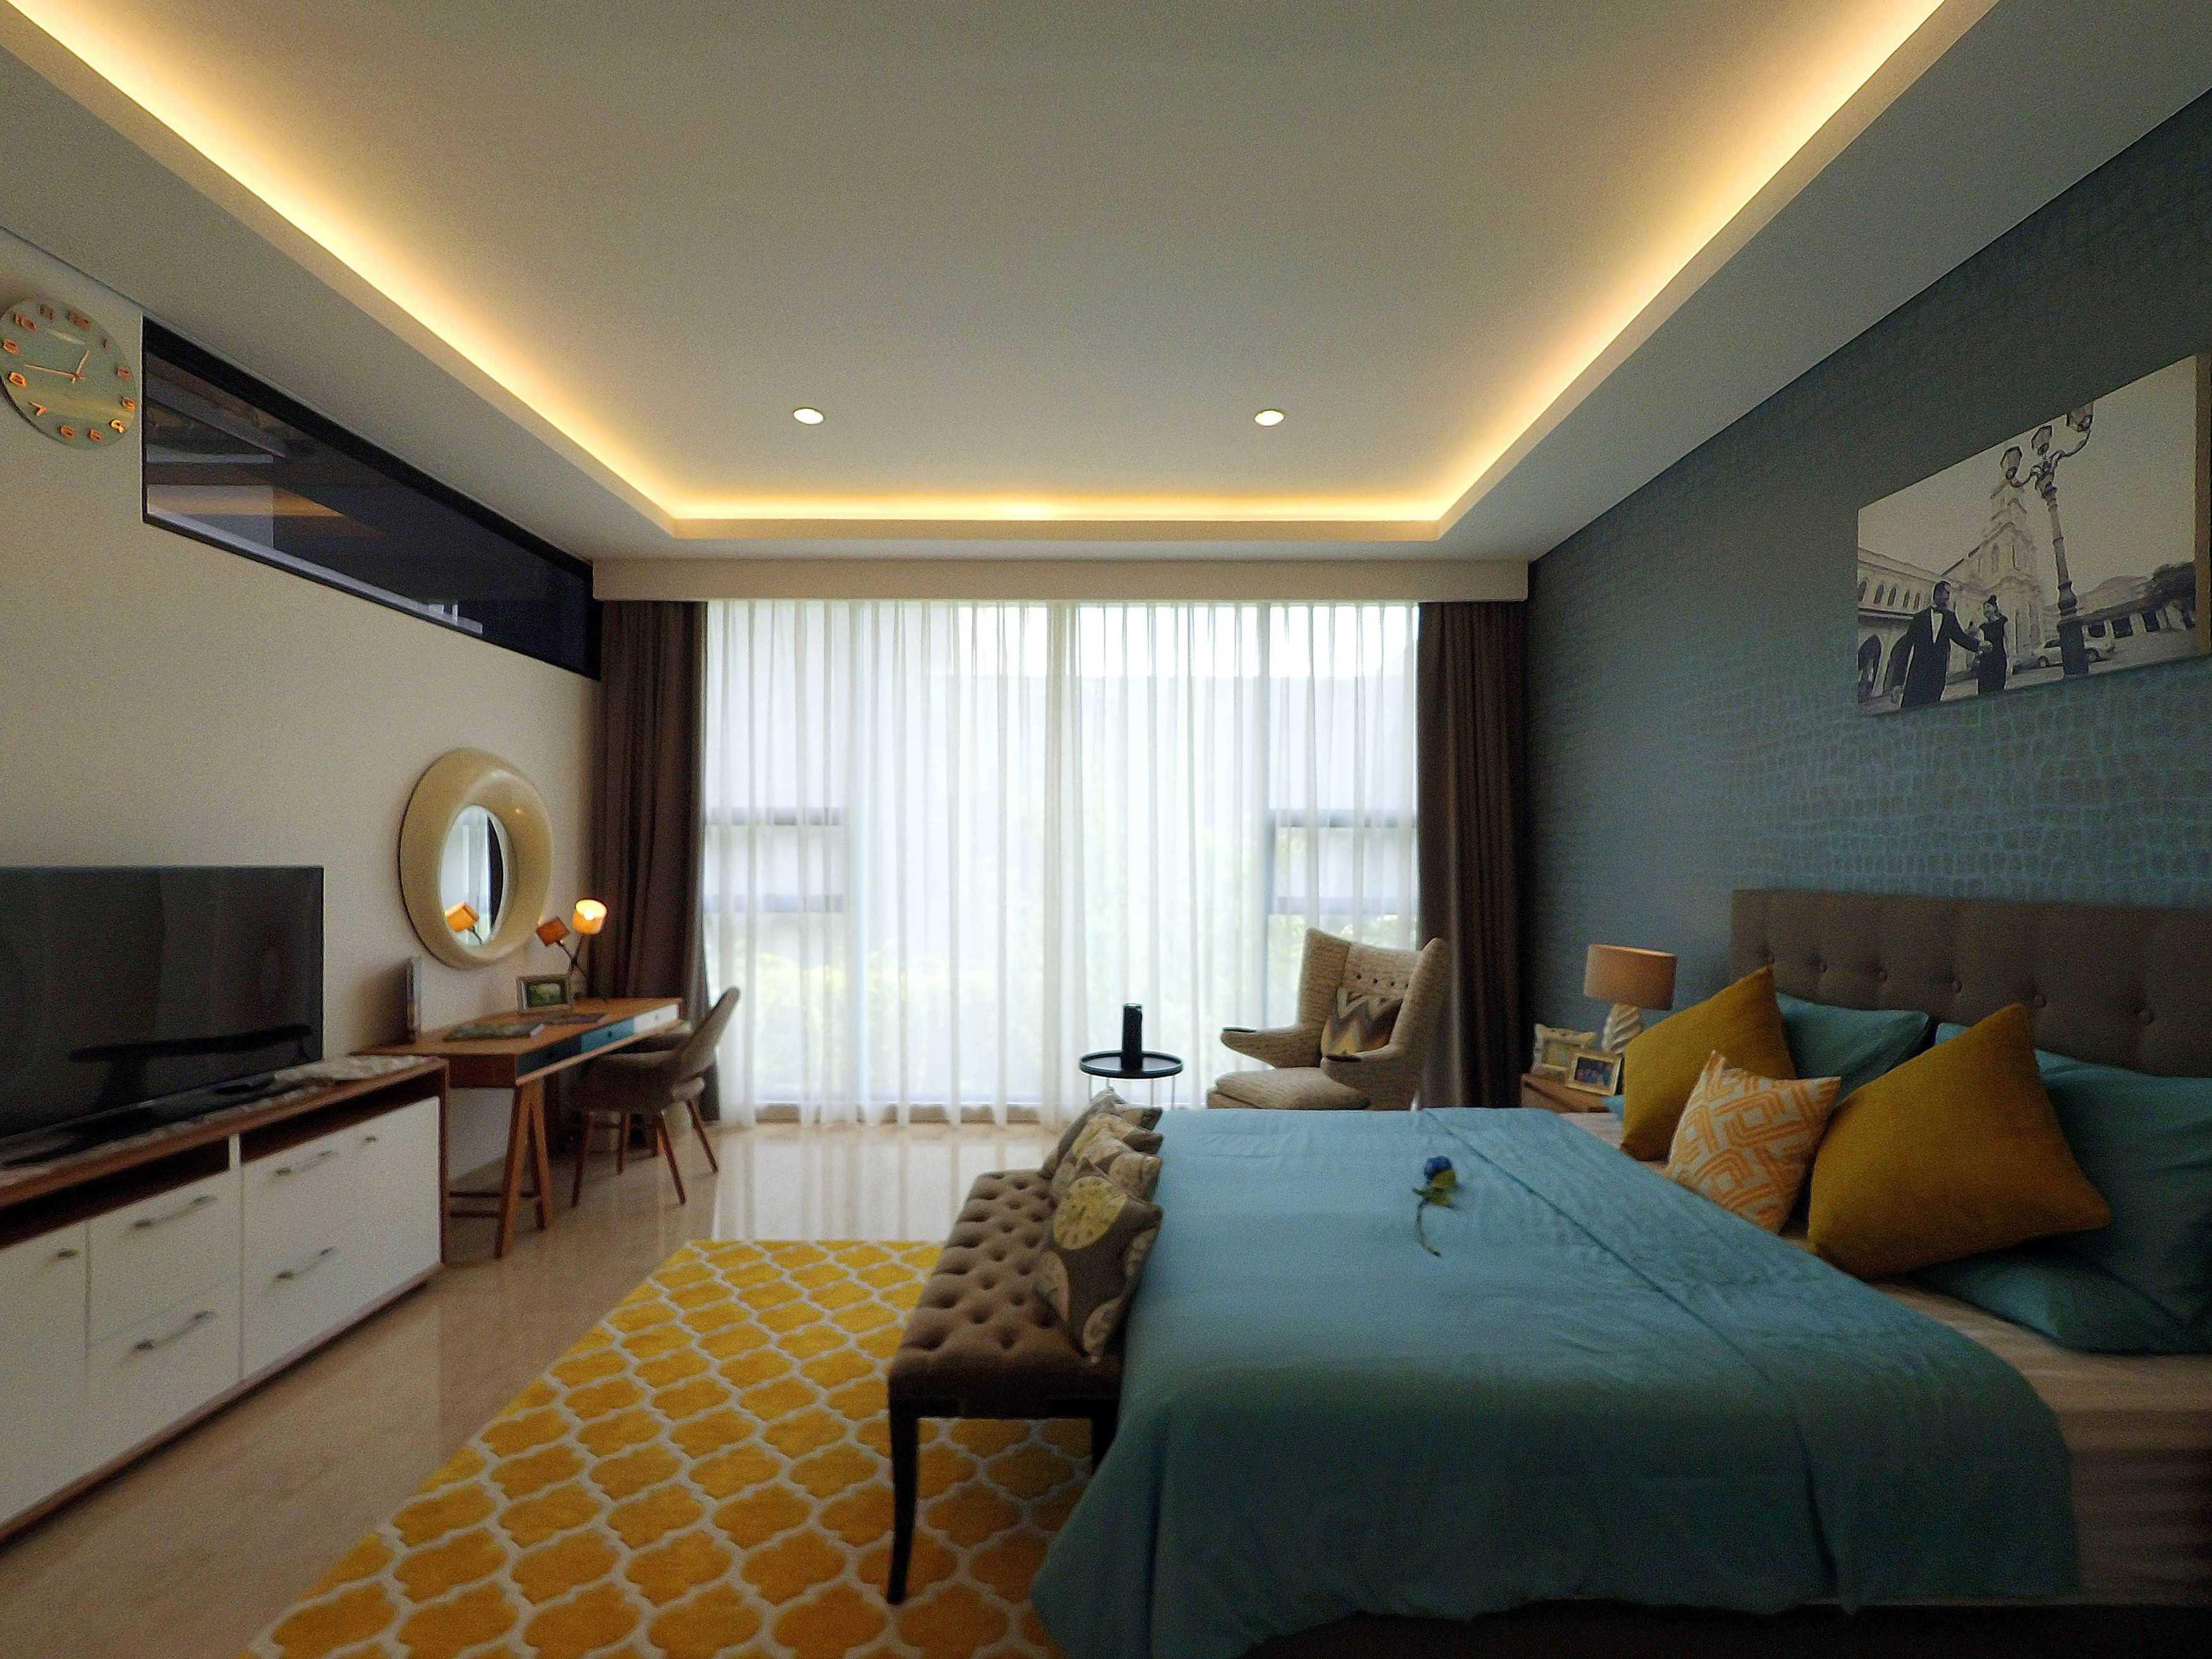 Dezan Studio Interior - Master Bedroom Pondok Indah,  Jakarta Pondok Indah,  Jakarta Bedroom Area Skandinavia  19401